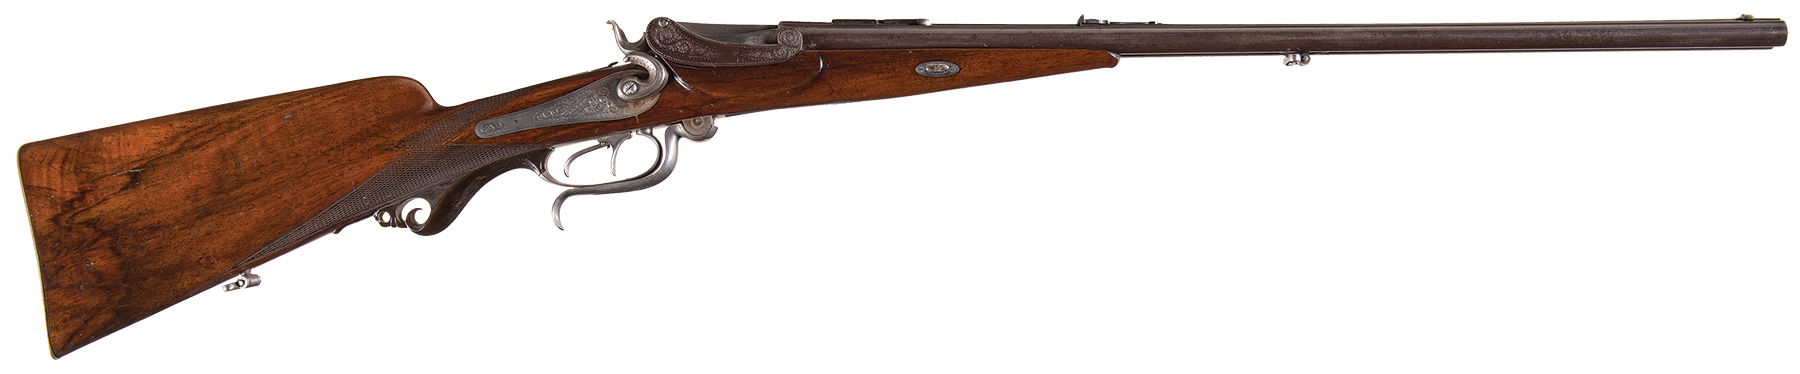 Miller & Greiss falling block double rifle